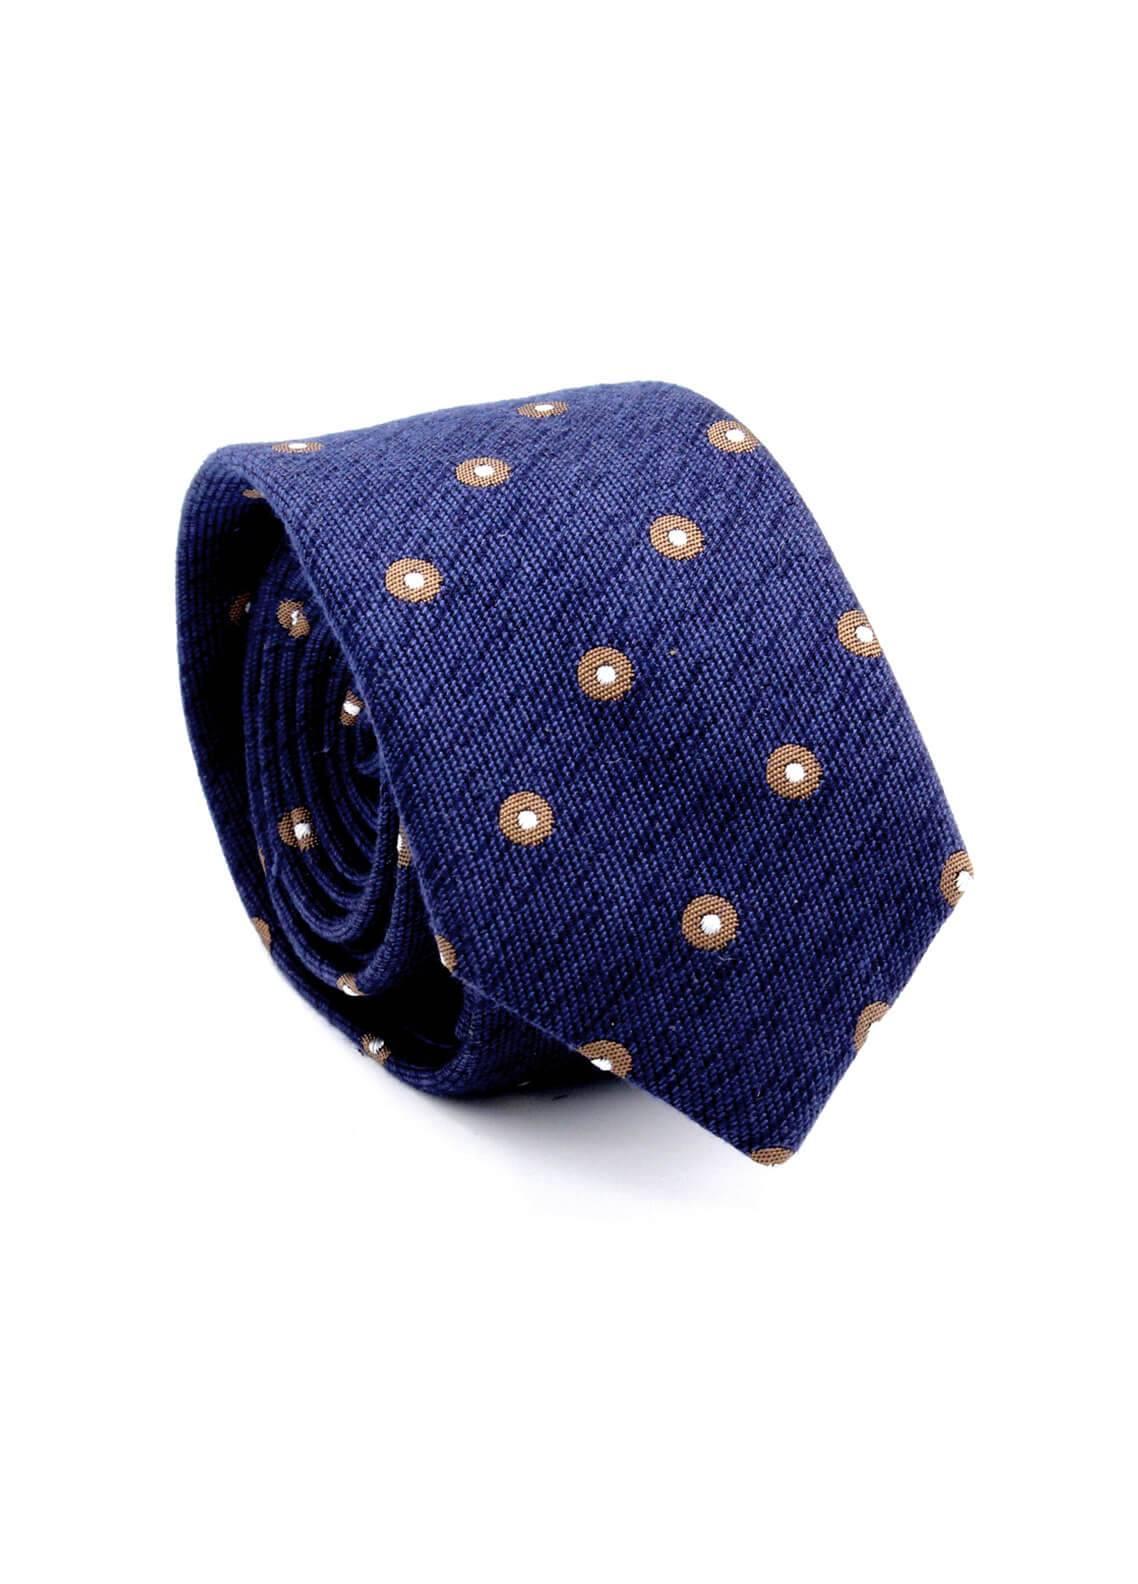 Skangen Narrow Wool Neck Tie Neck Tie SKTI-W-015 -